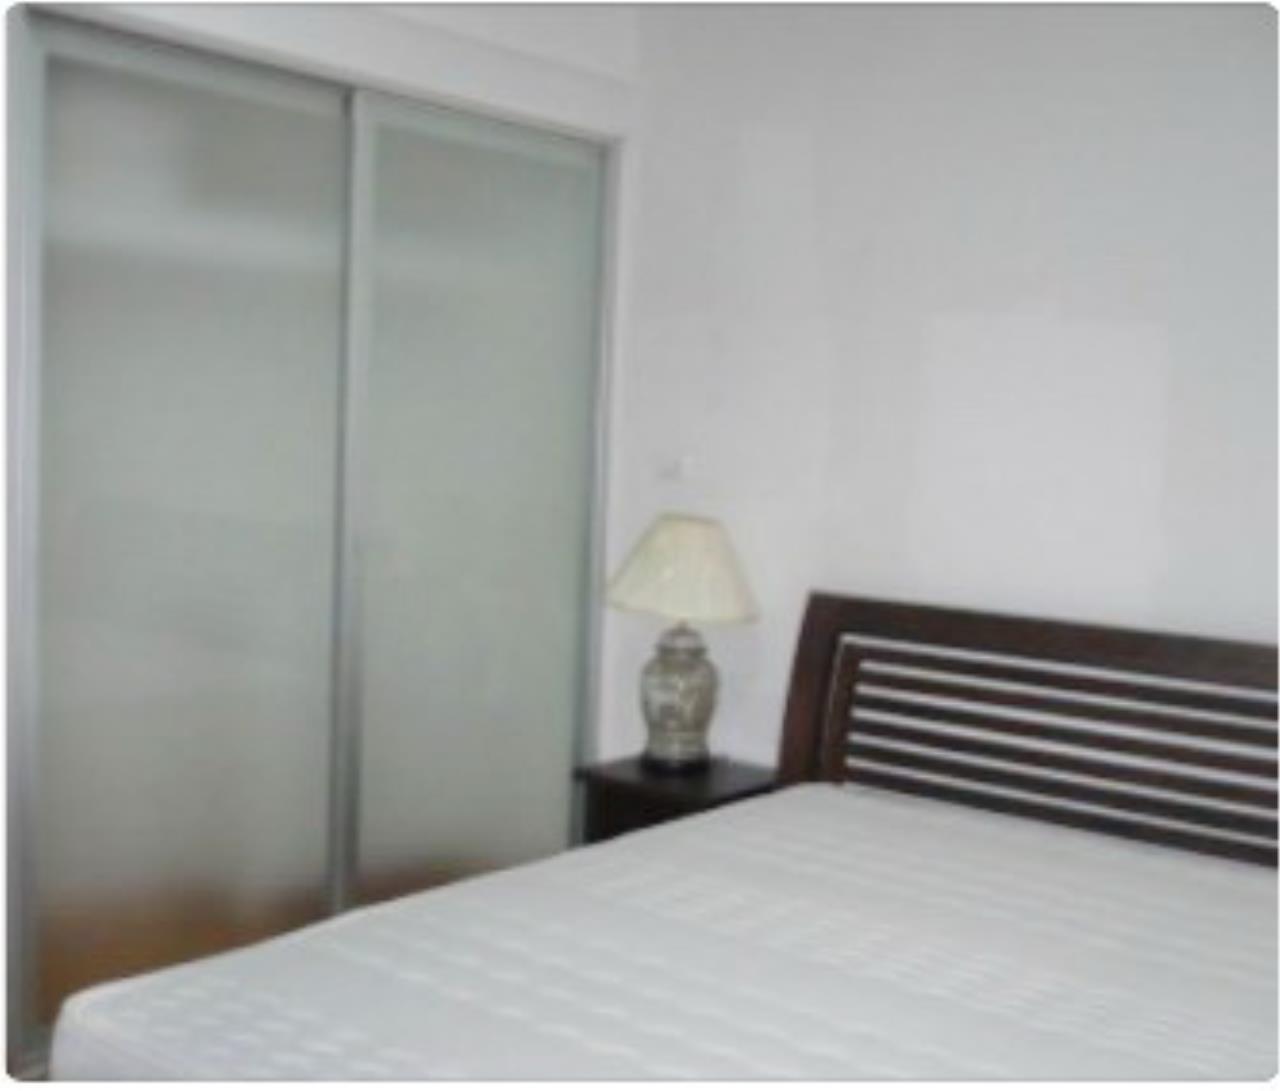 Agent - Mayteekul Sujirapinyokul Agency's AC6180418 For Rent Condo Supalai Premier Place Asoke Condo MRT Phetchaburi 5